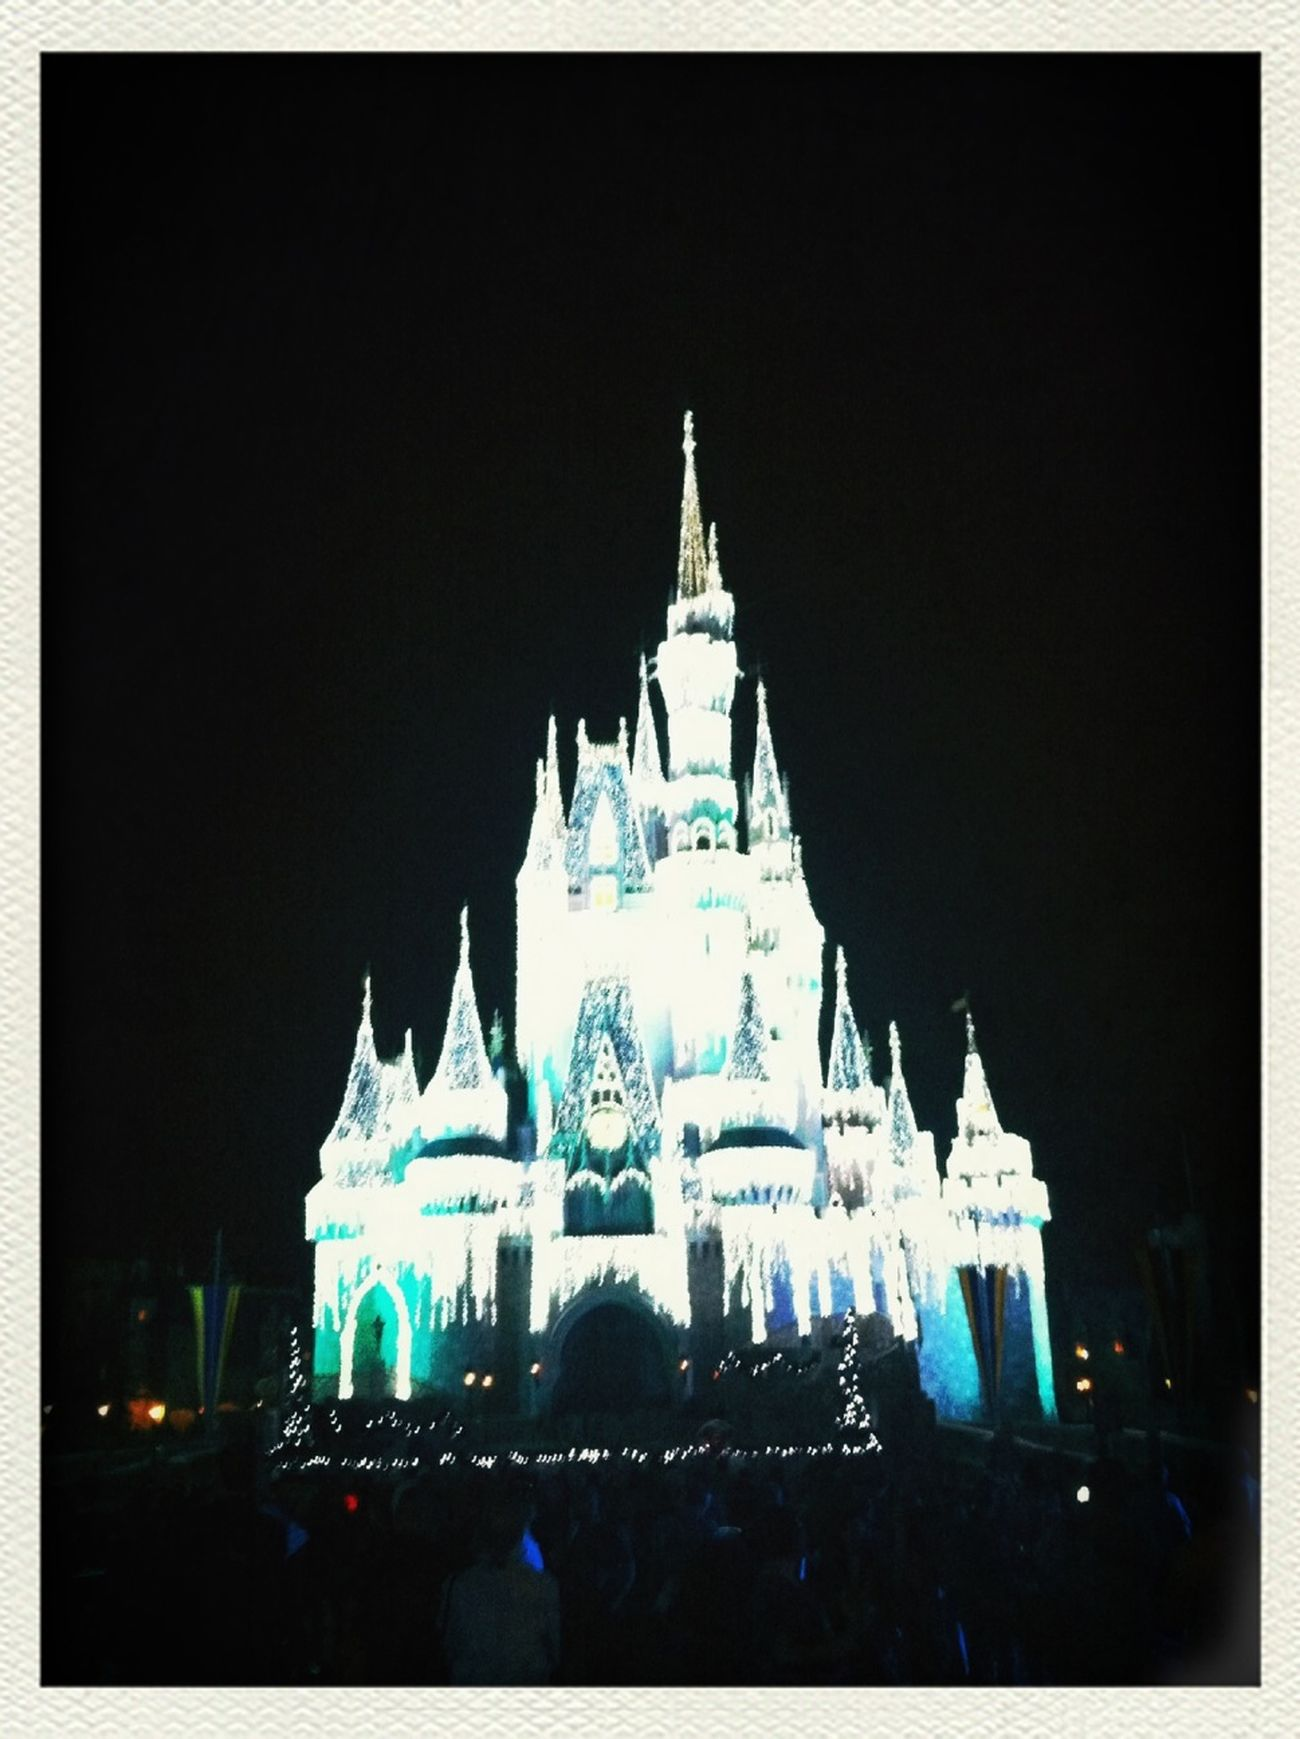 Disneypalaceatnight